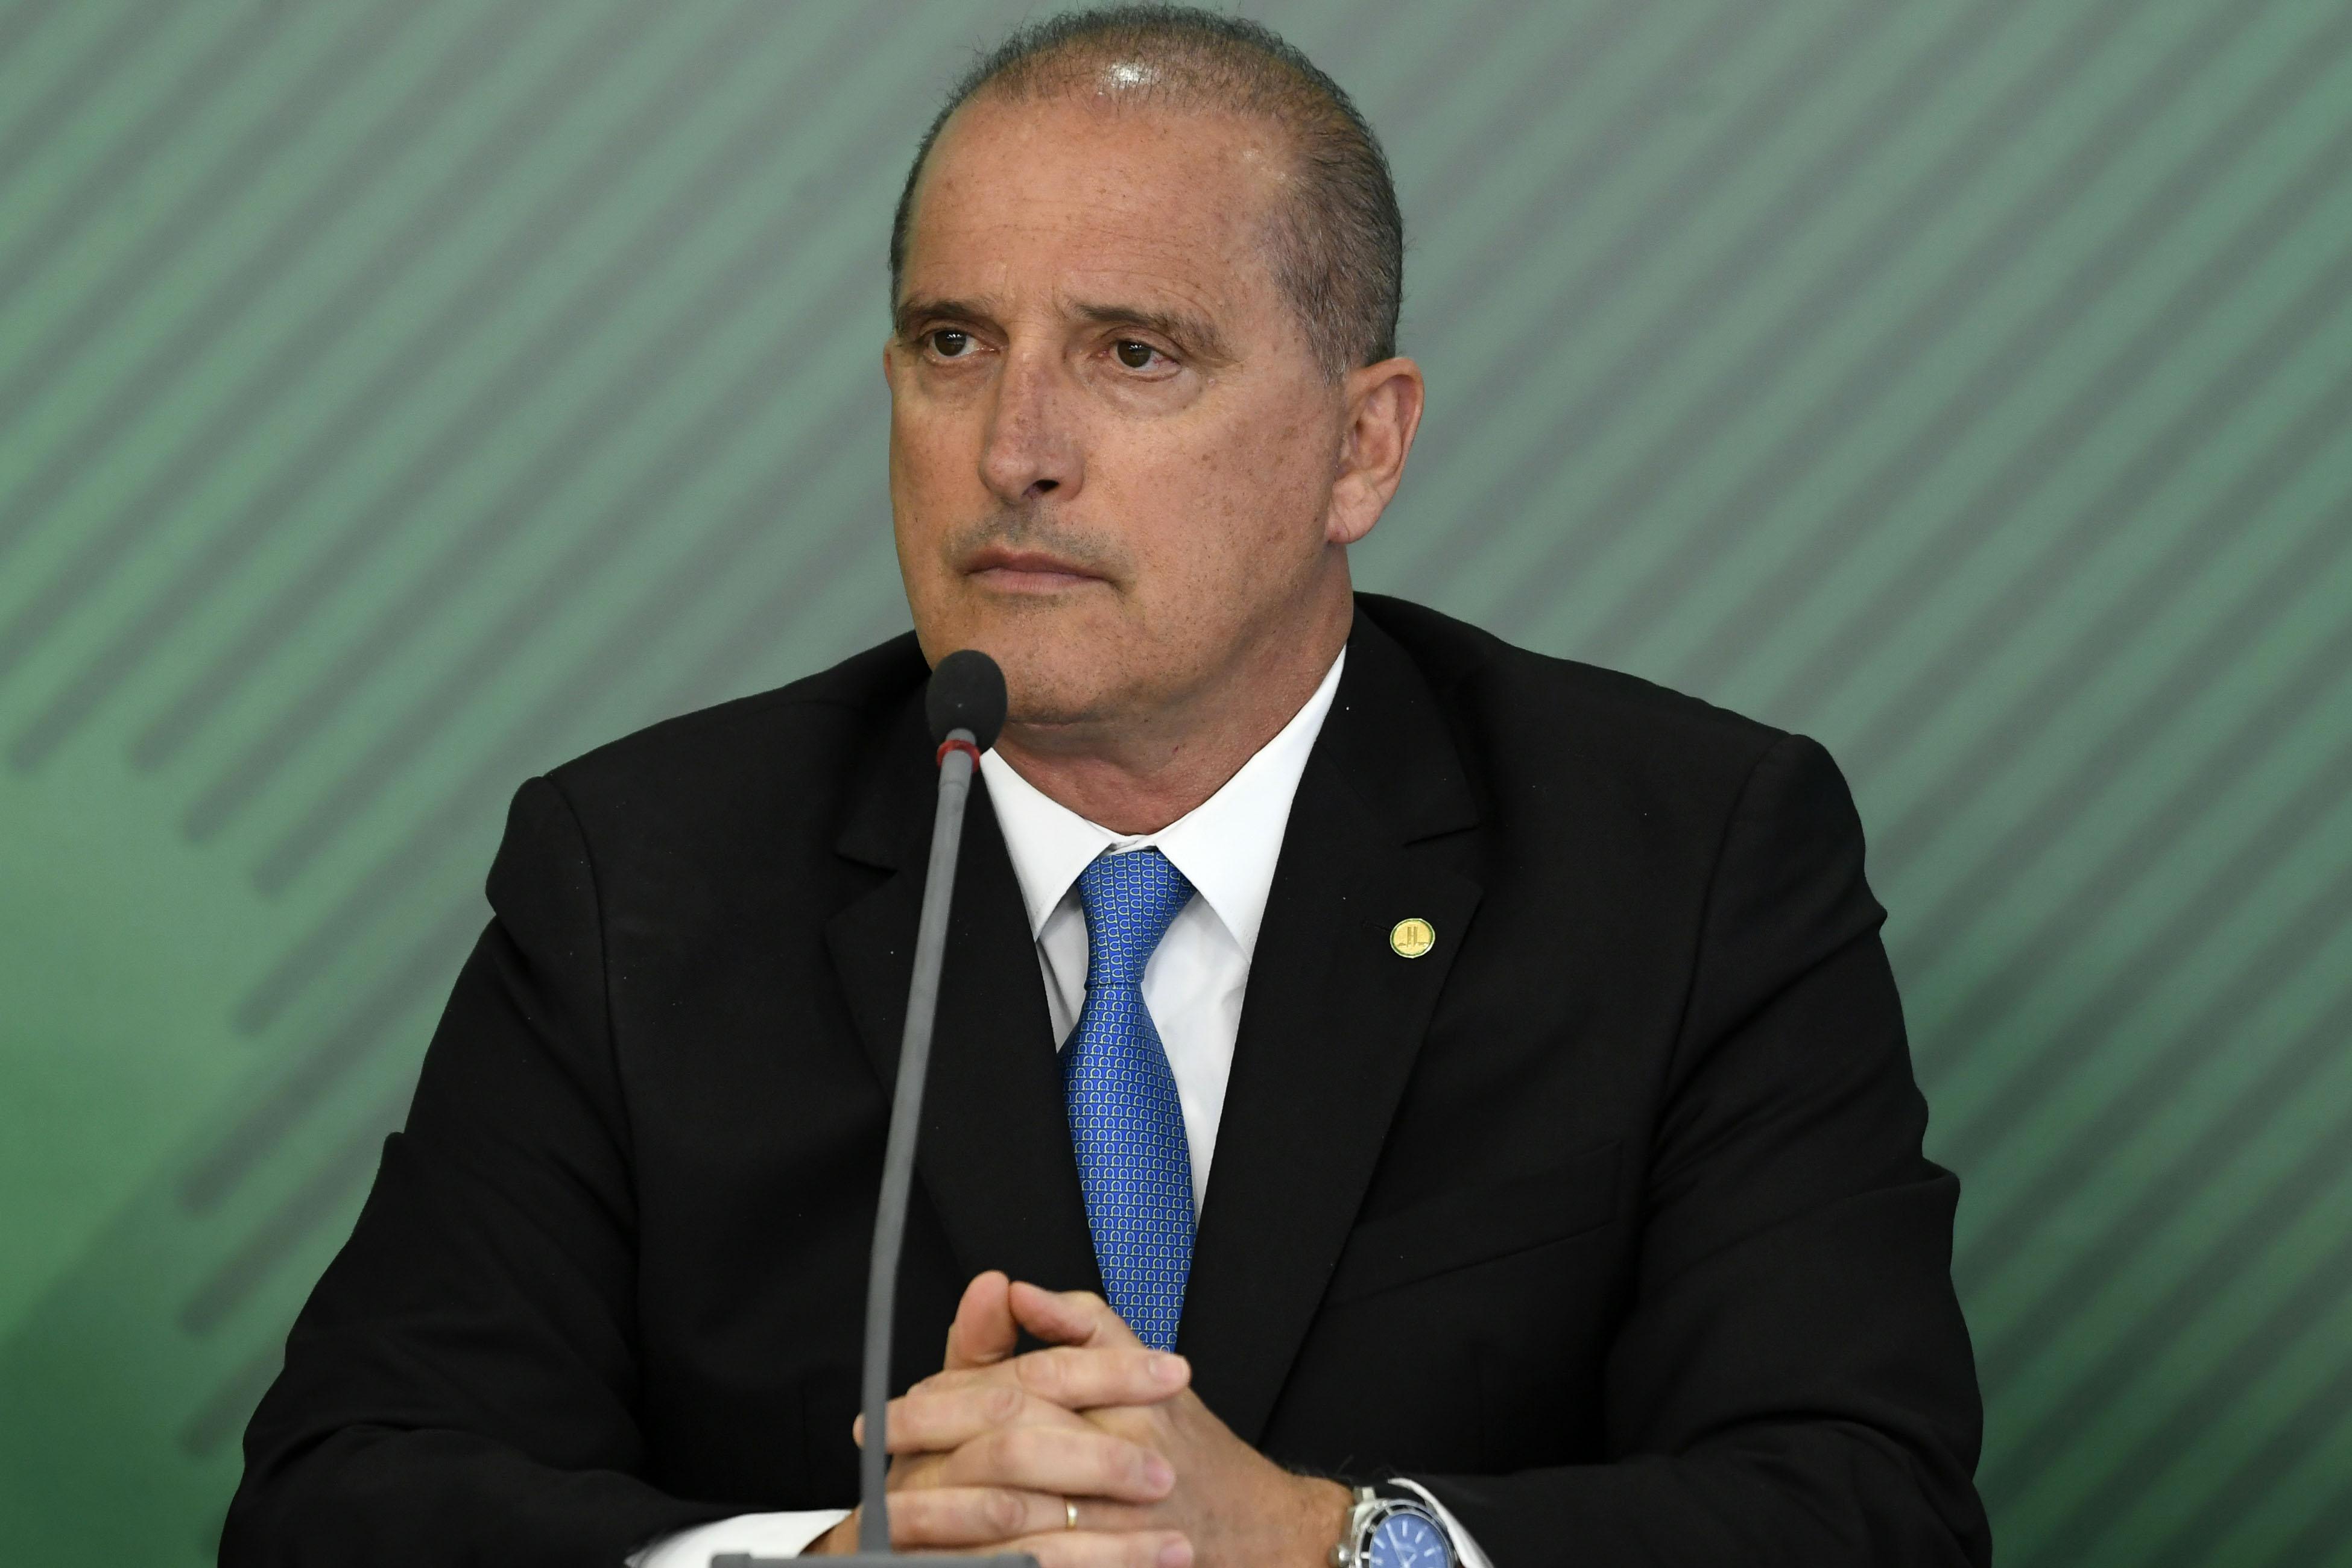 Brazil's Minister of Citizenship Onyx Lorenzoni attends a meeting in Brasília on January 29, 2019.